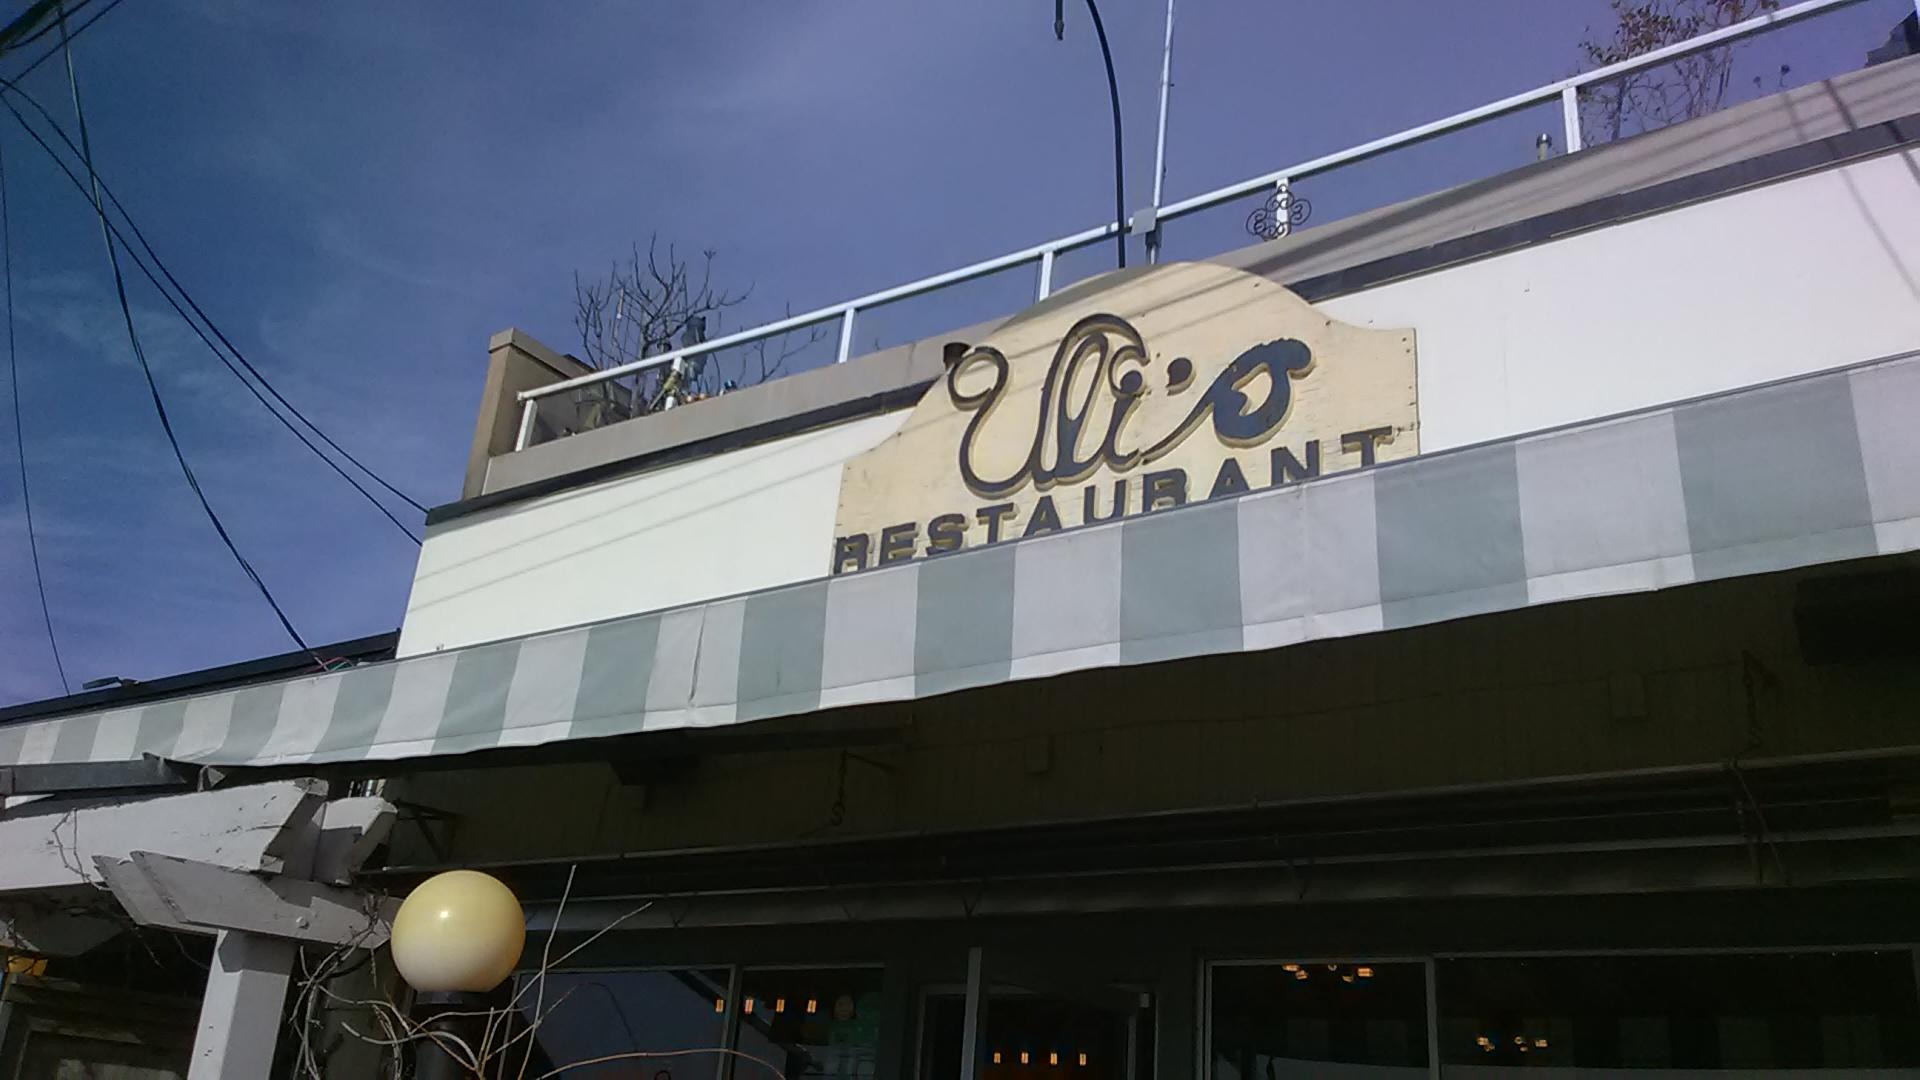 Uli's Restaurant at Taste White Rock 2019